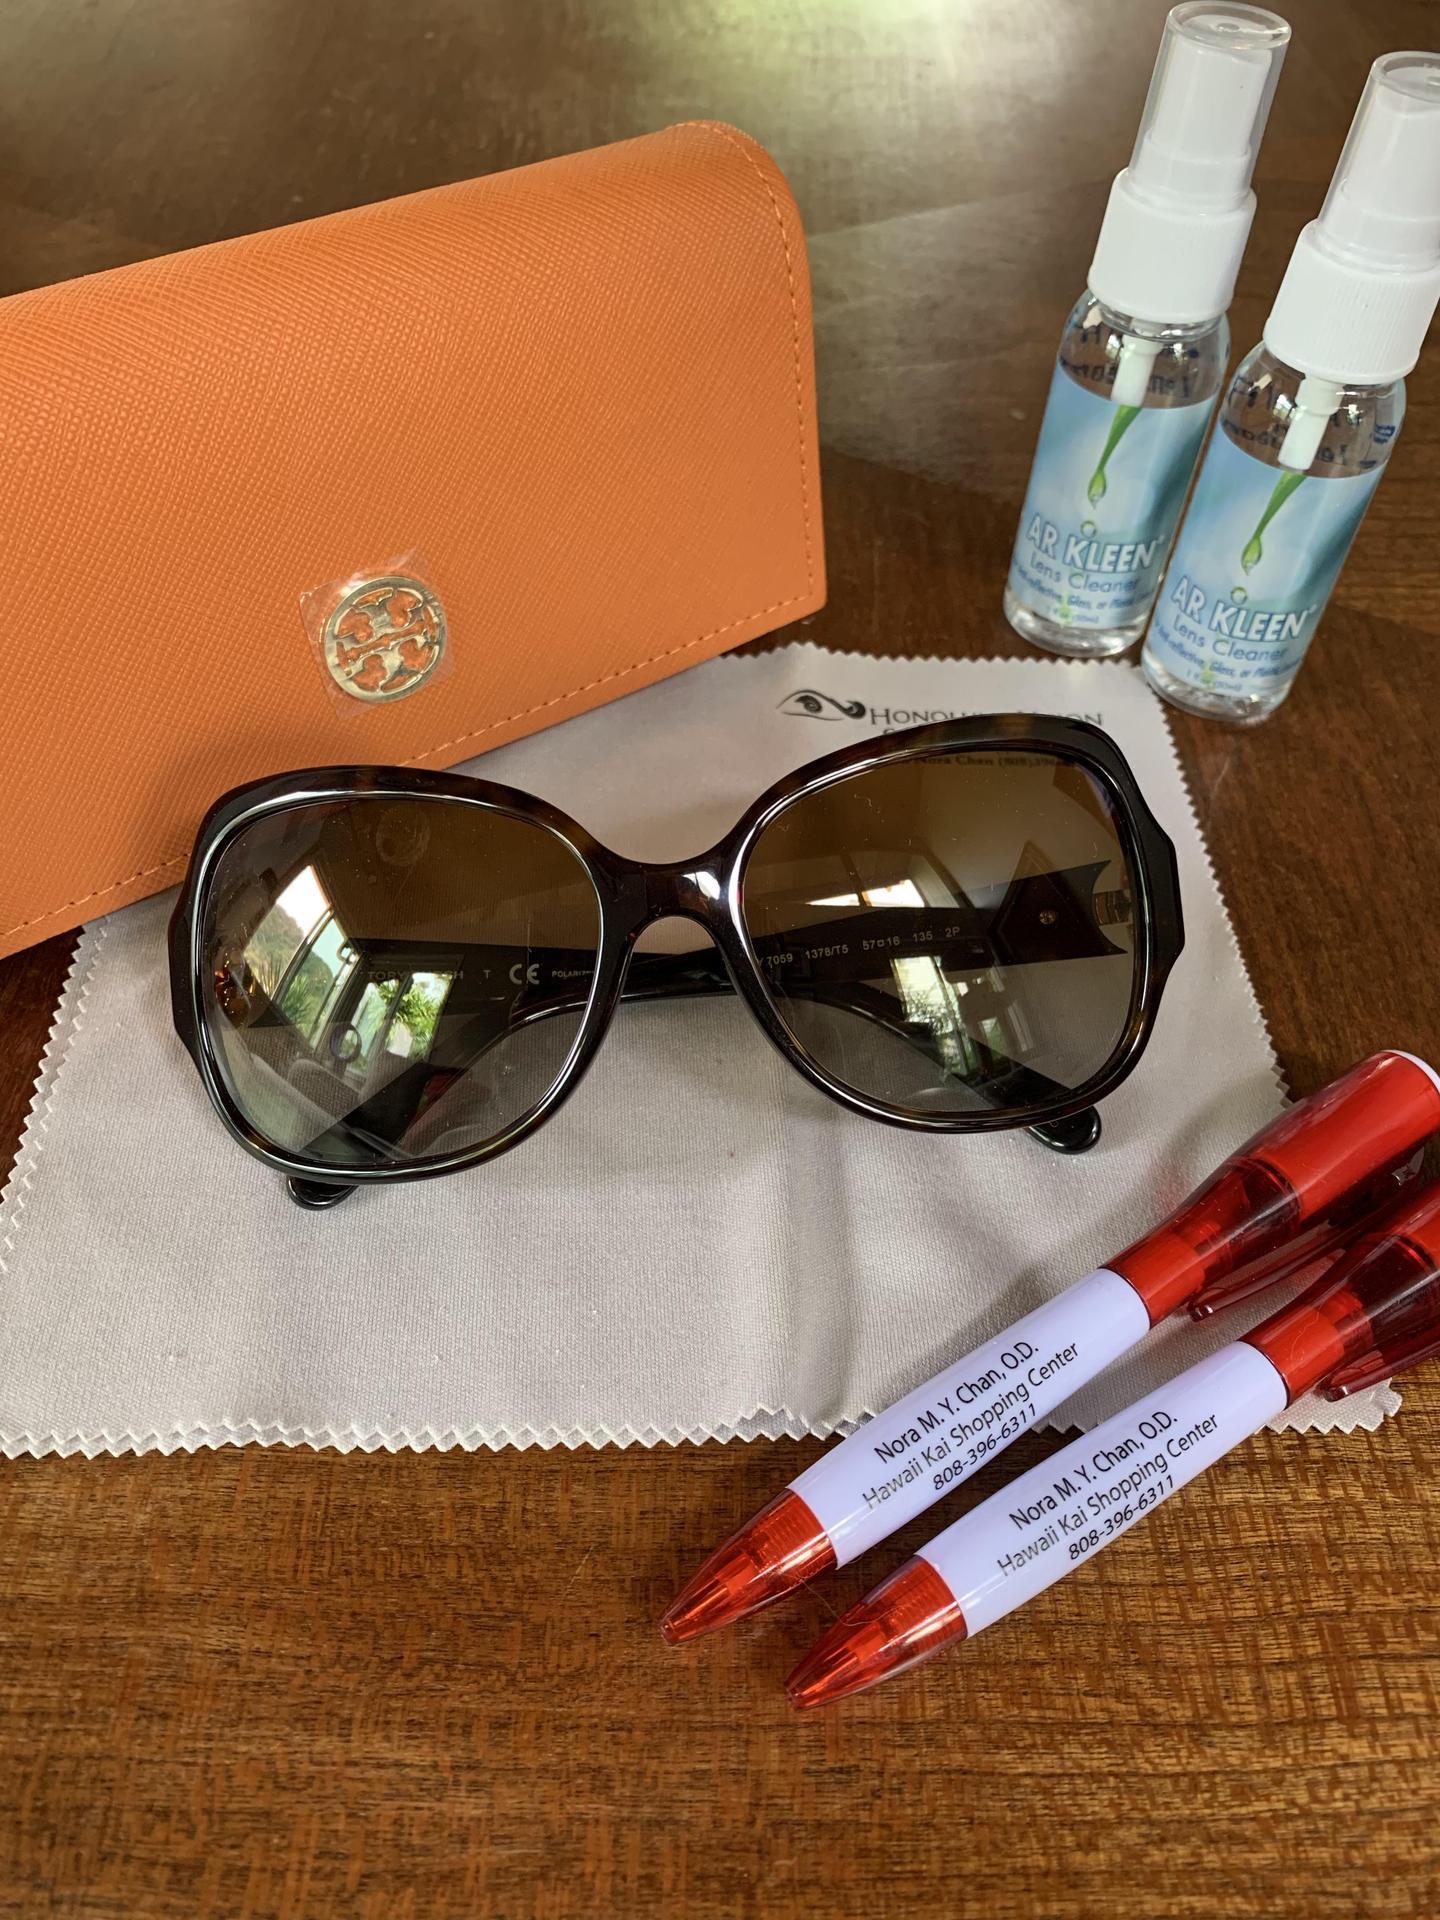 Tori Richards Sunglasses and Kit